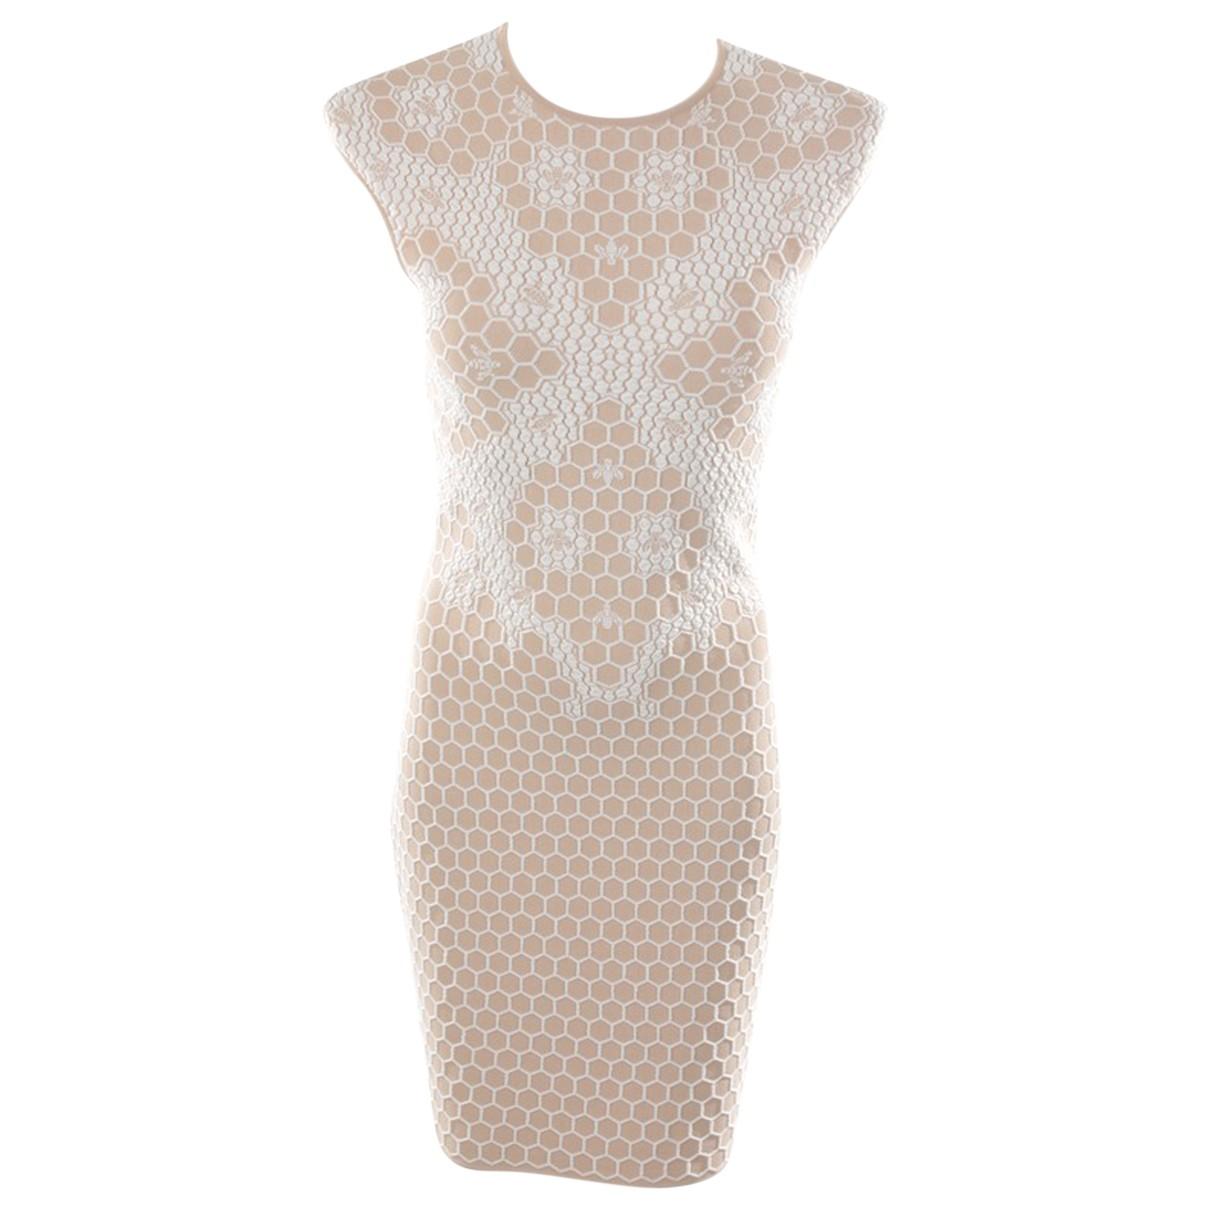 Alexander Mcqueen \N Beige dress for Women M International